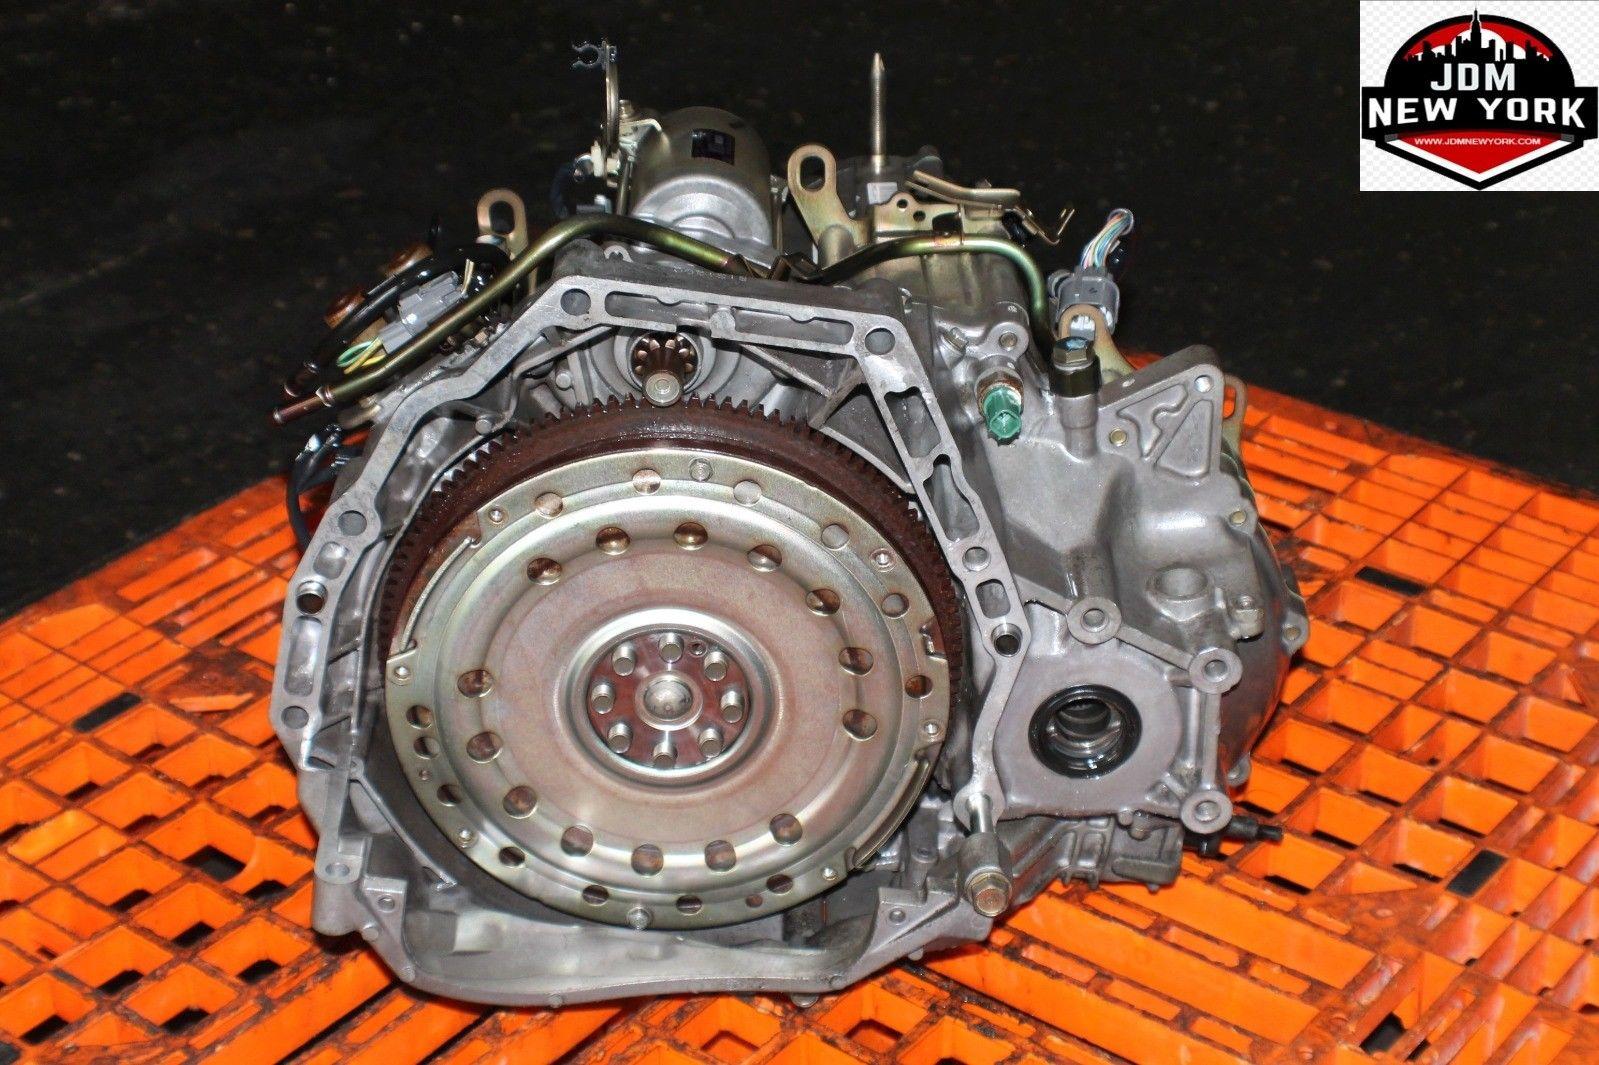 [SCHEMATICS_43NM]  1998-2002 HONDA ACCORD 2.3L 4-CYLINDER AUTOMATIC TRANSMISSION JDM F23A MCJA  MGPA | JDM New York | 98 Accord 4 Cyl Engine Diagram |  | JDM New York